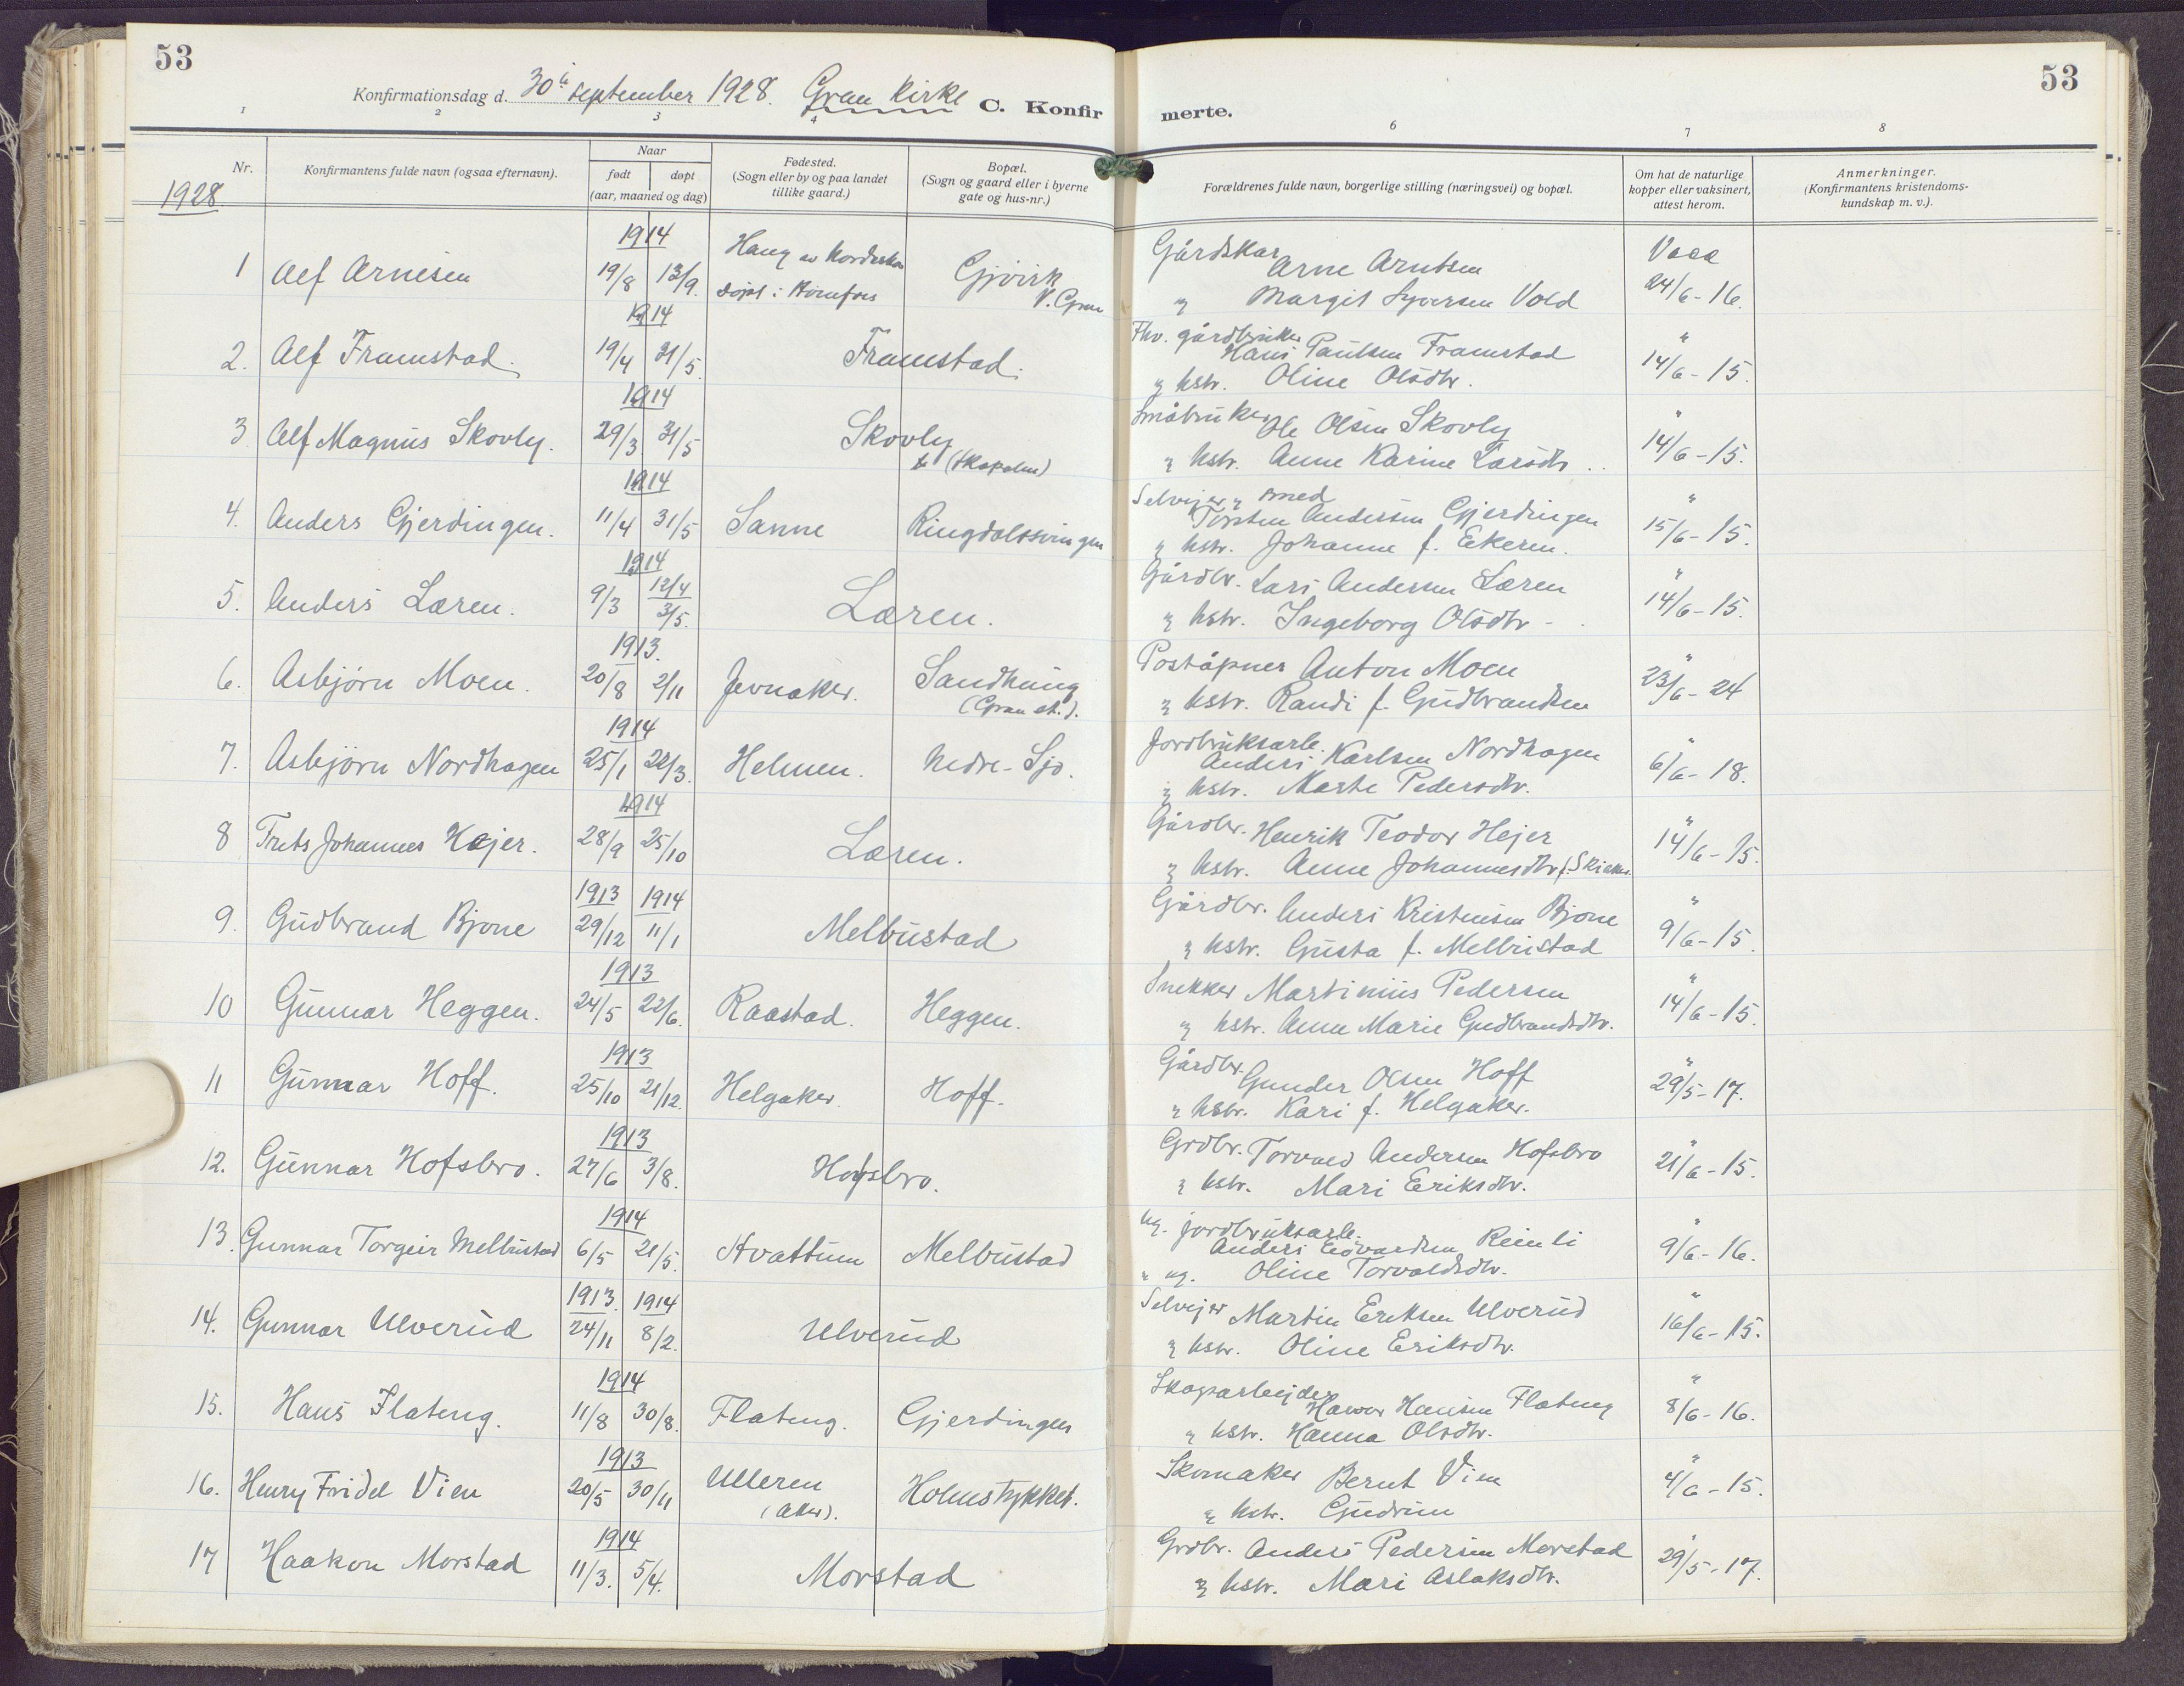 SAH, Gran prestekontor, Ministerialbok nr. 23, 1919-1938, s. 53